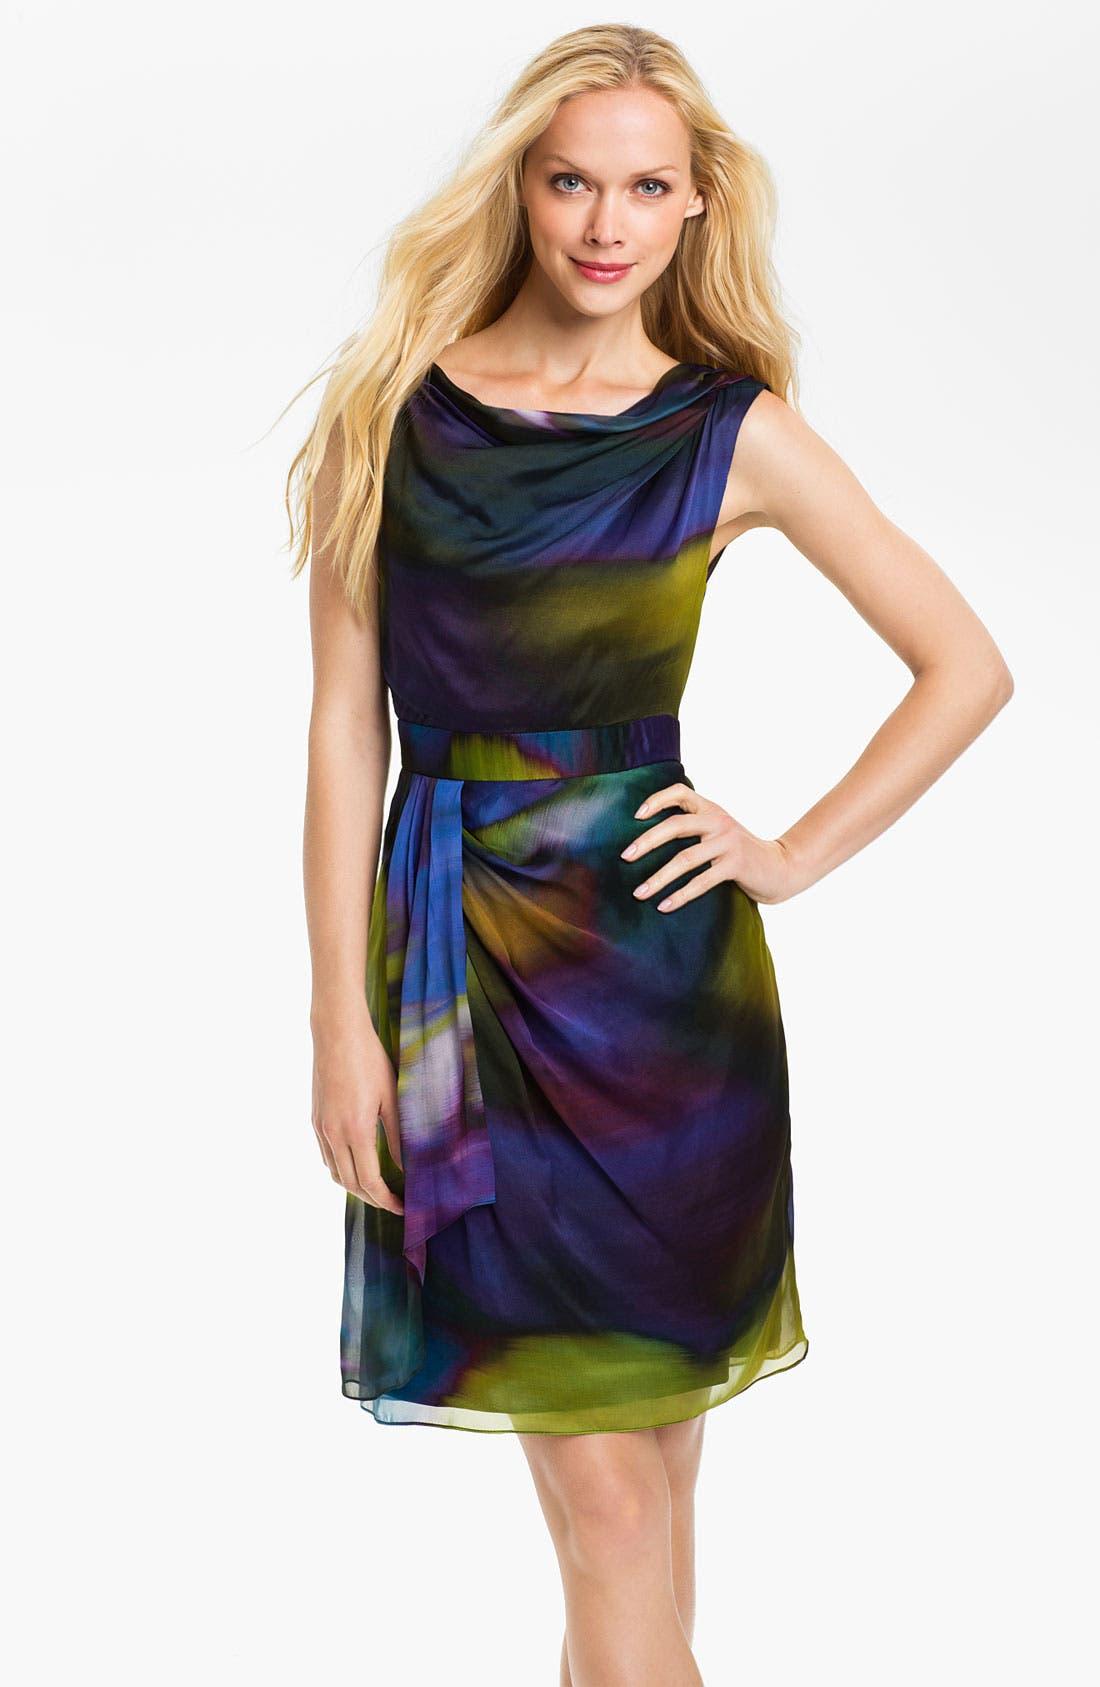 Alternate Image 1 Selected - Suzi Chin for Maggy Boutique Side Drape Silk Dress (Petite)